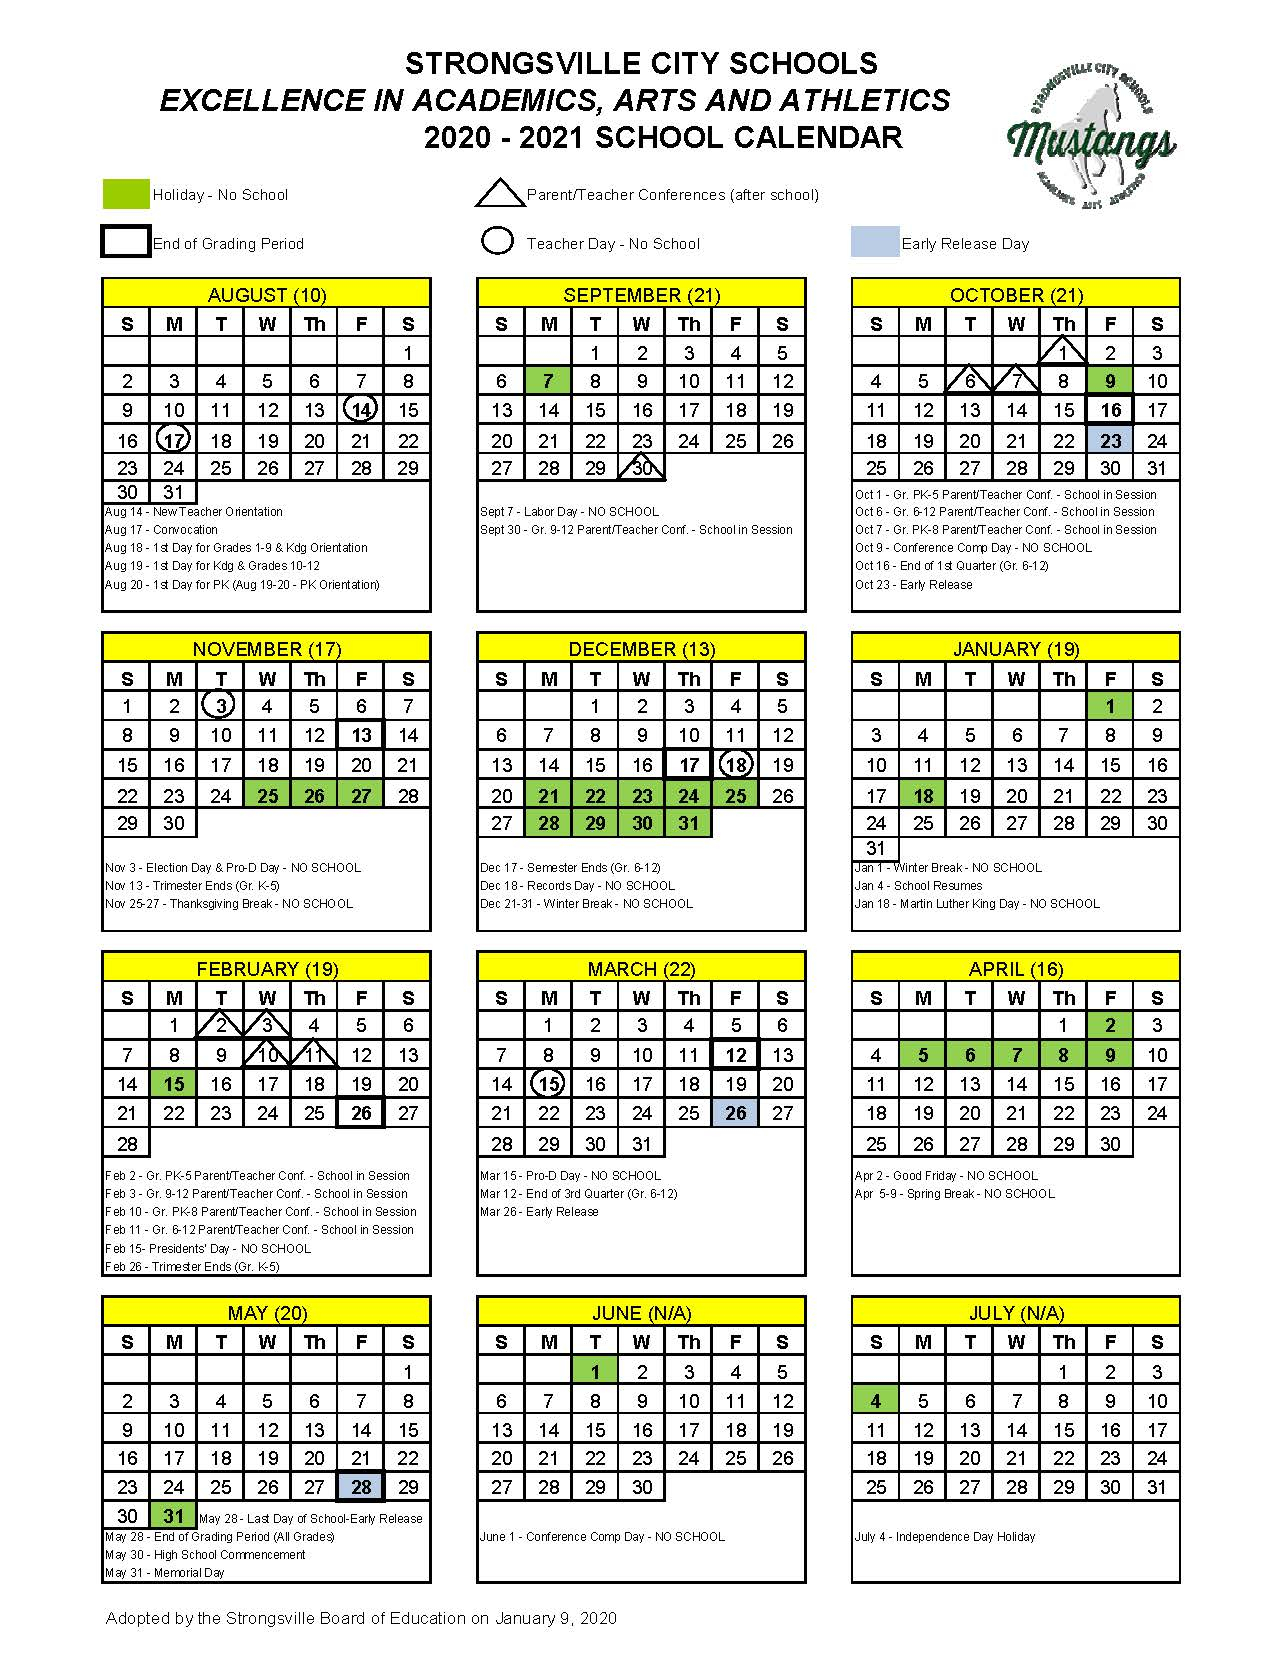 Academic Calendars / Calendar 2020 2021 In Case Western Reserve University Academic Calendar